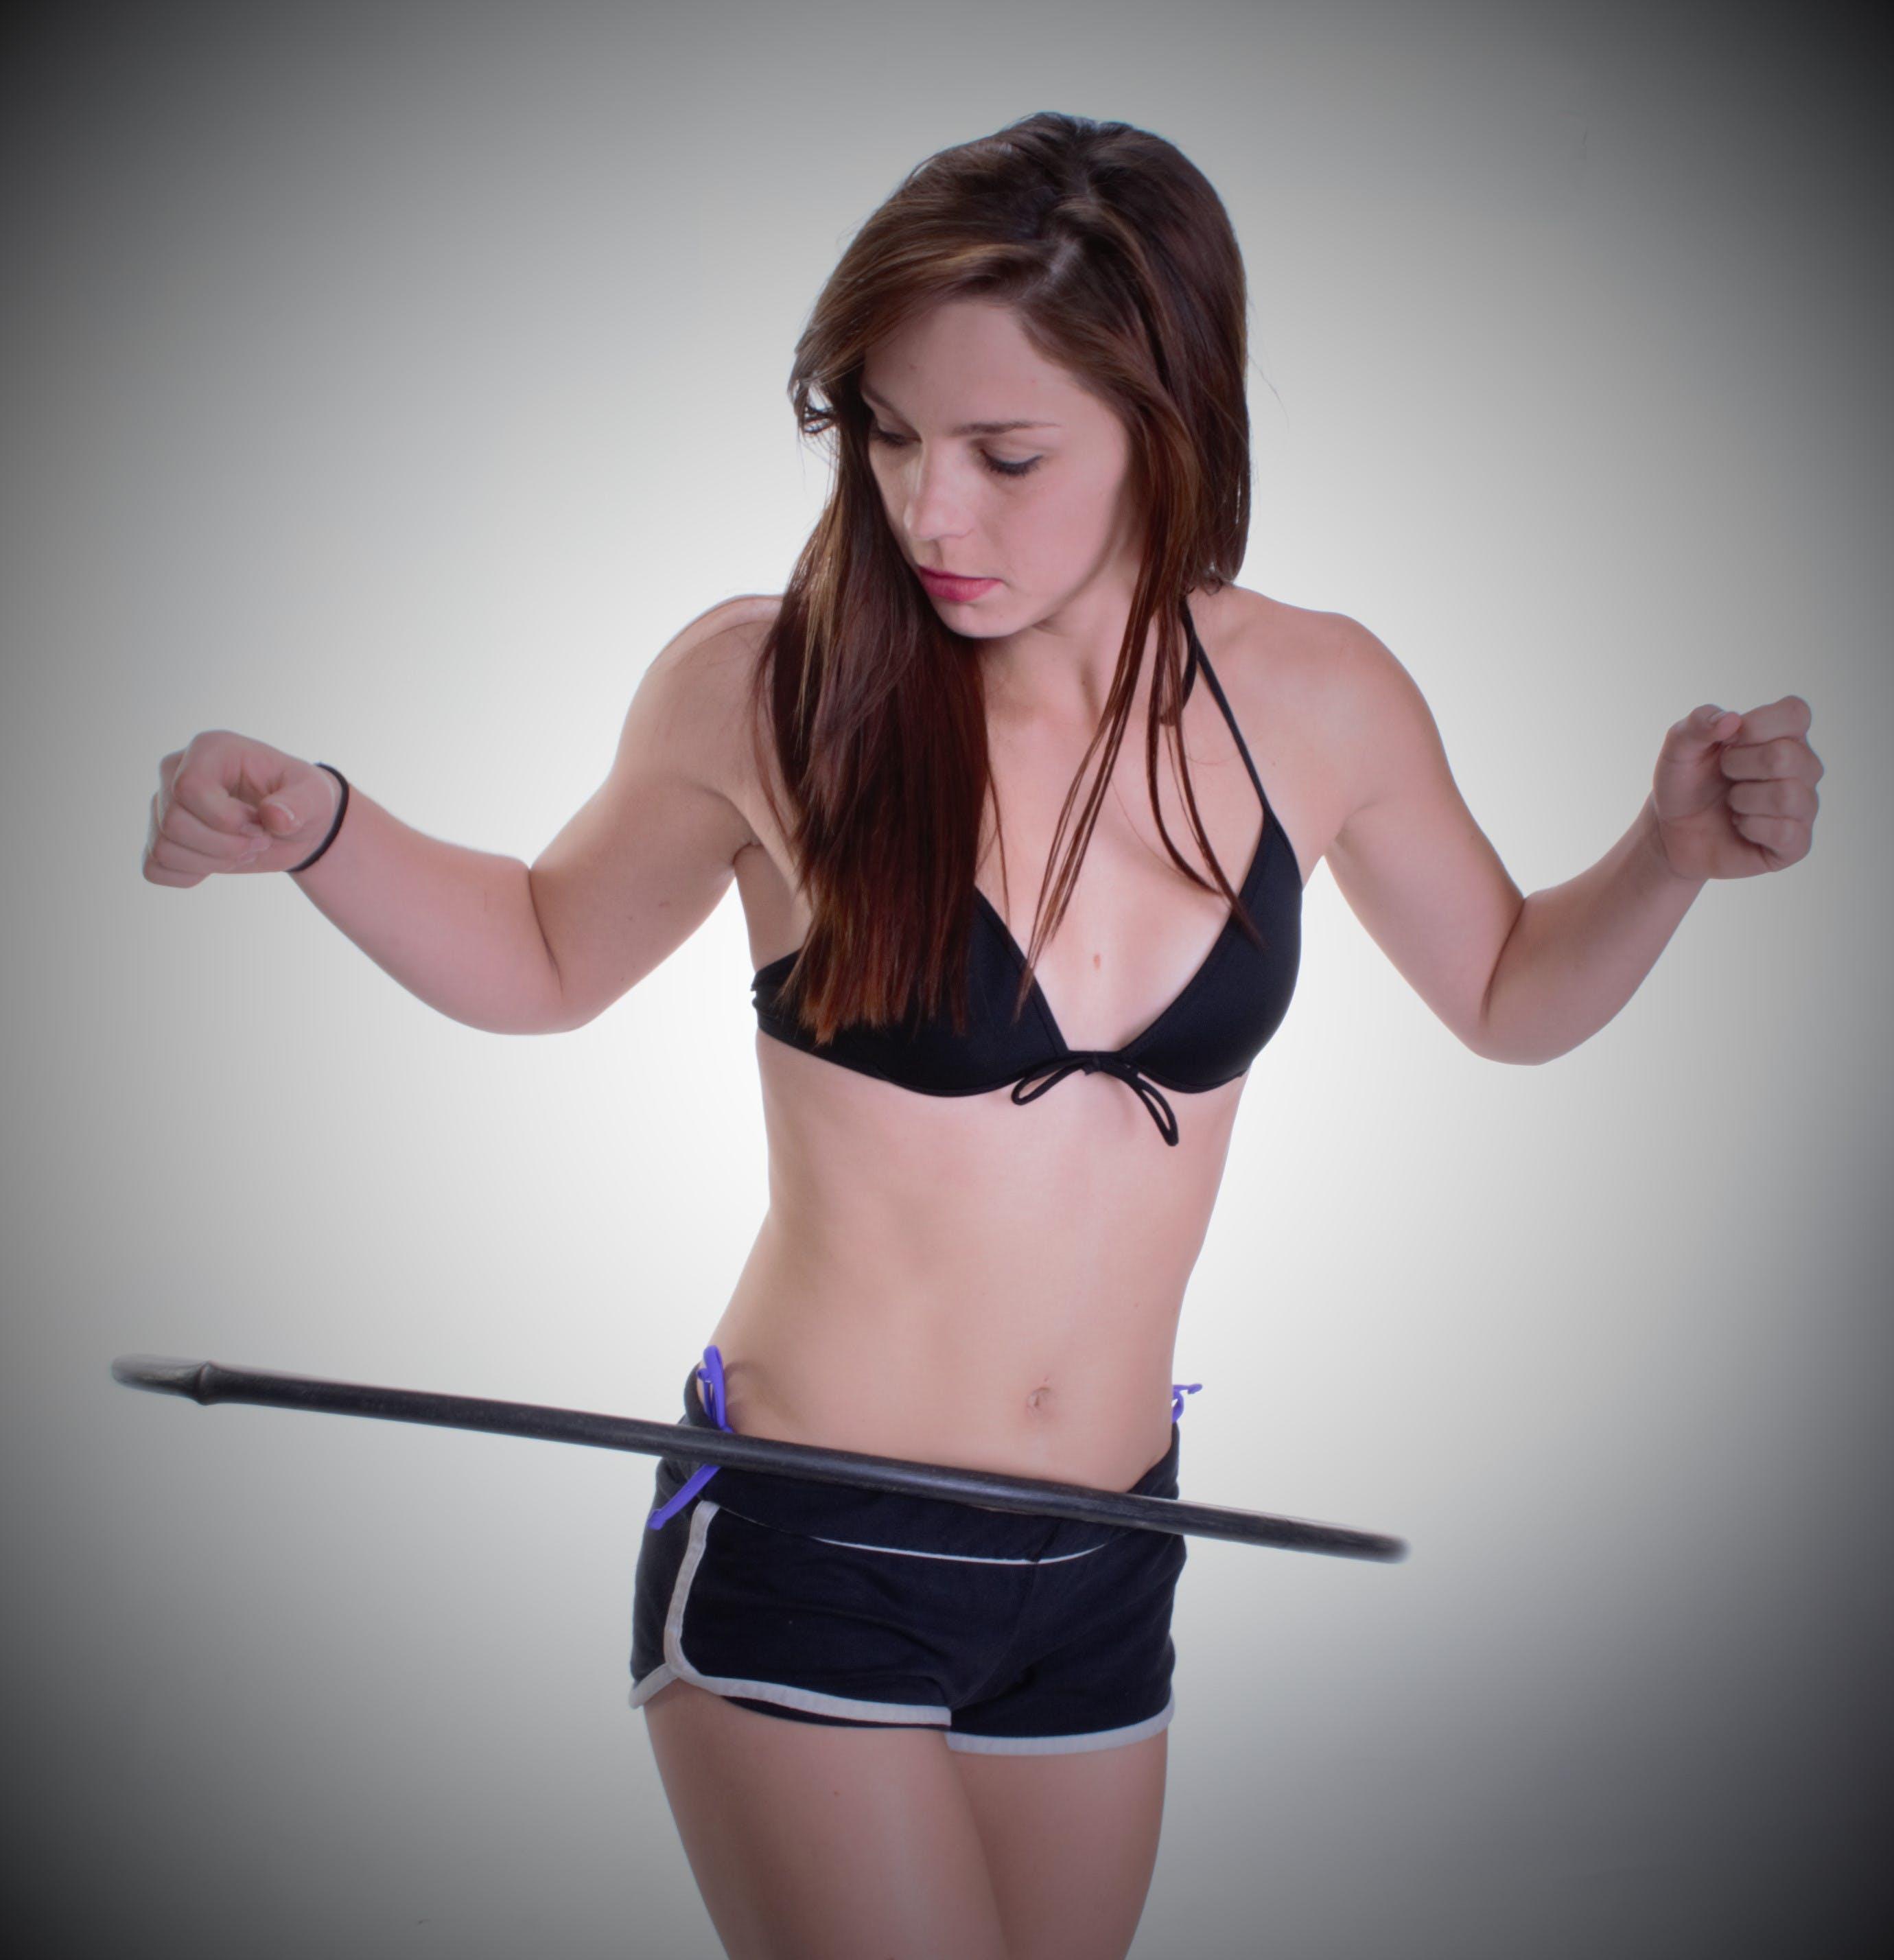 Woman Playing Hula Hoop